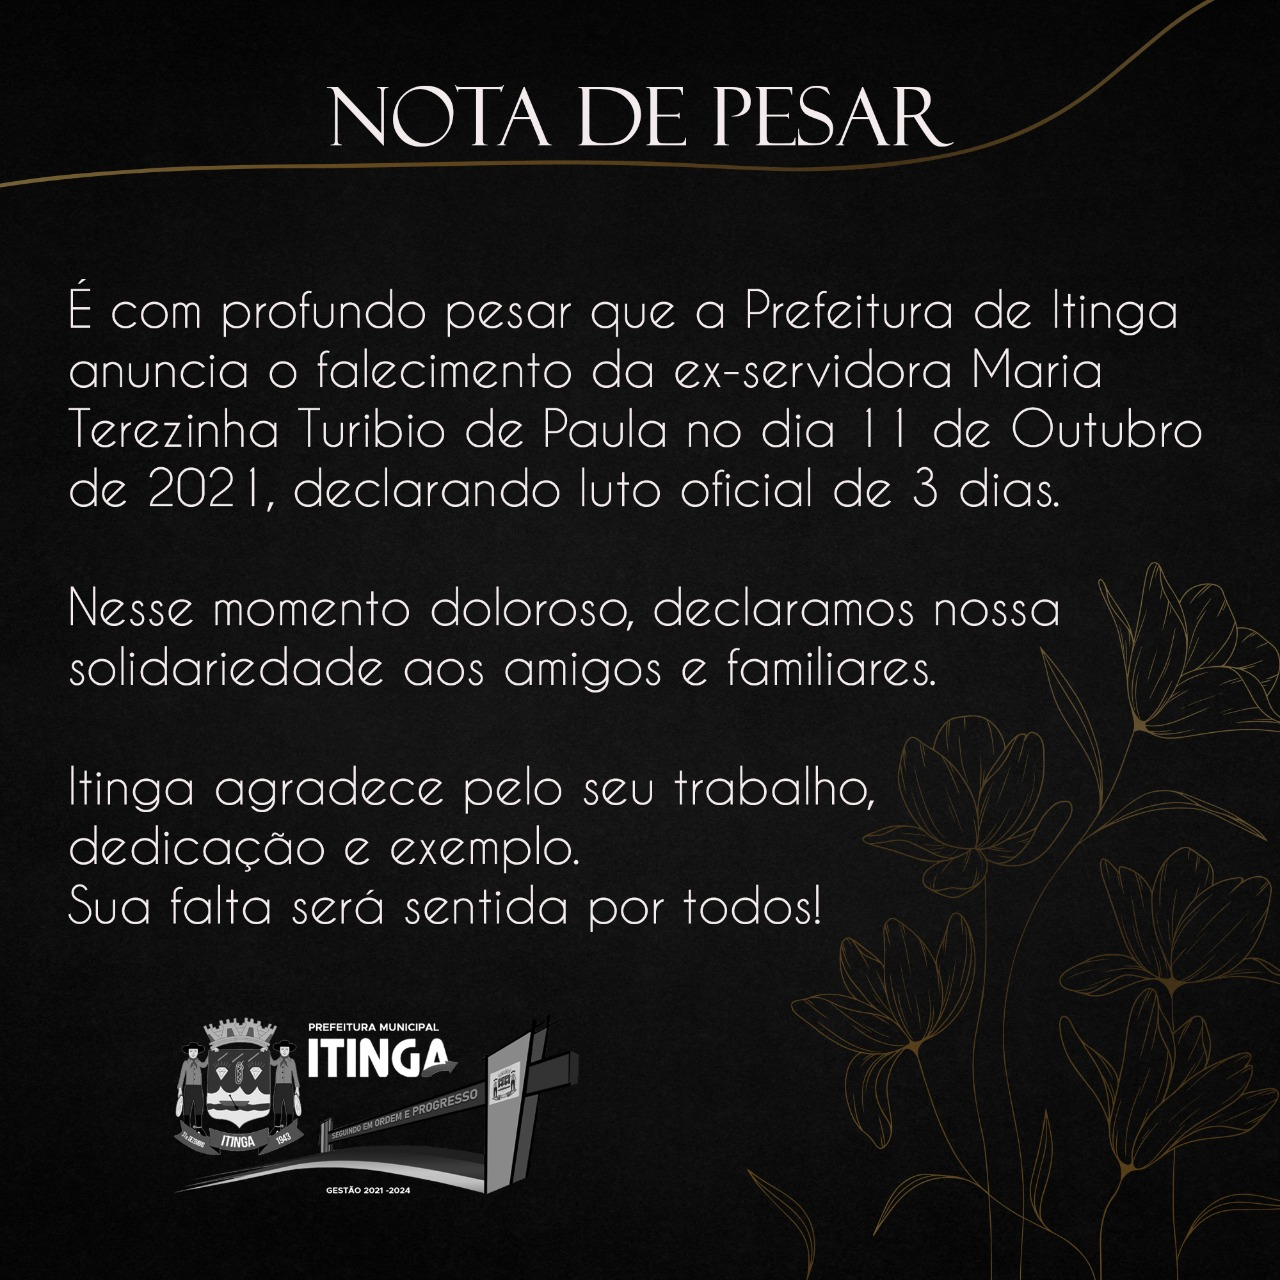 NOTA DE PESAR - 13/10/2021